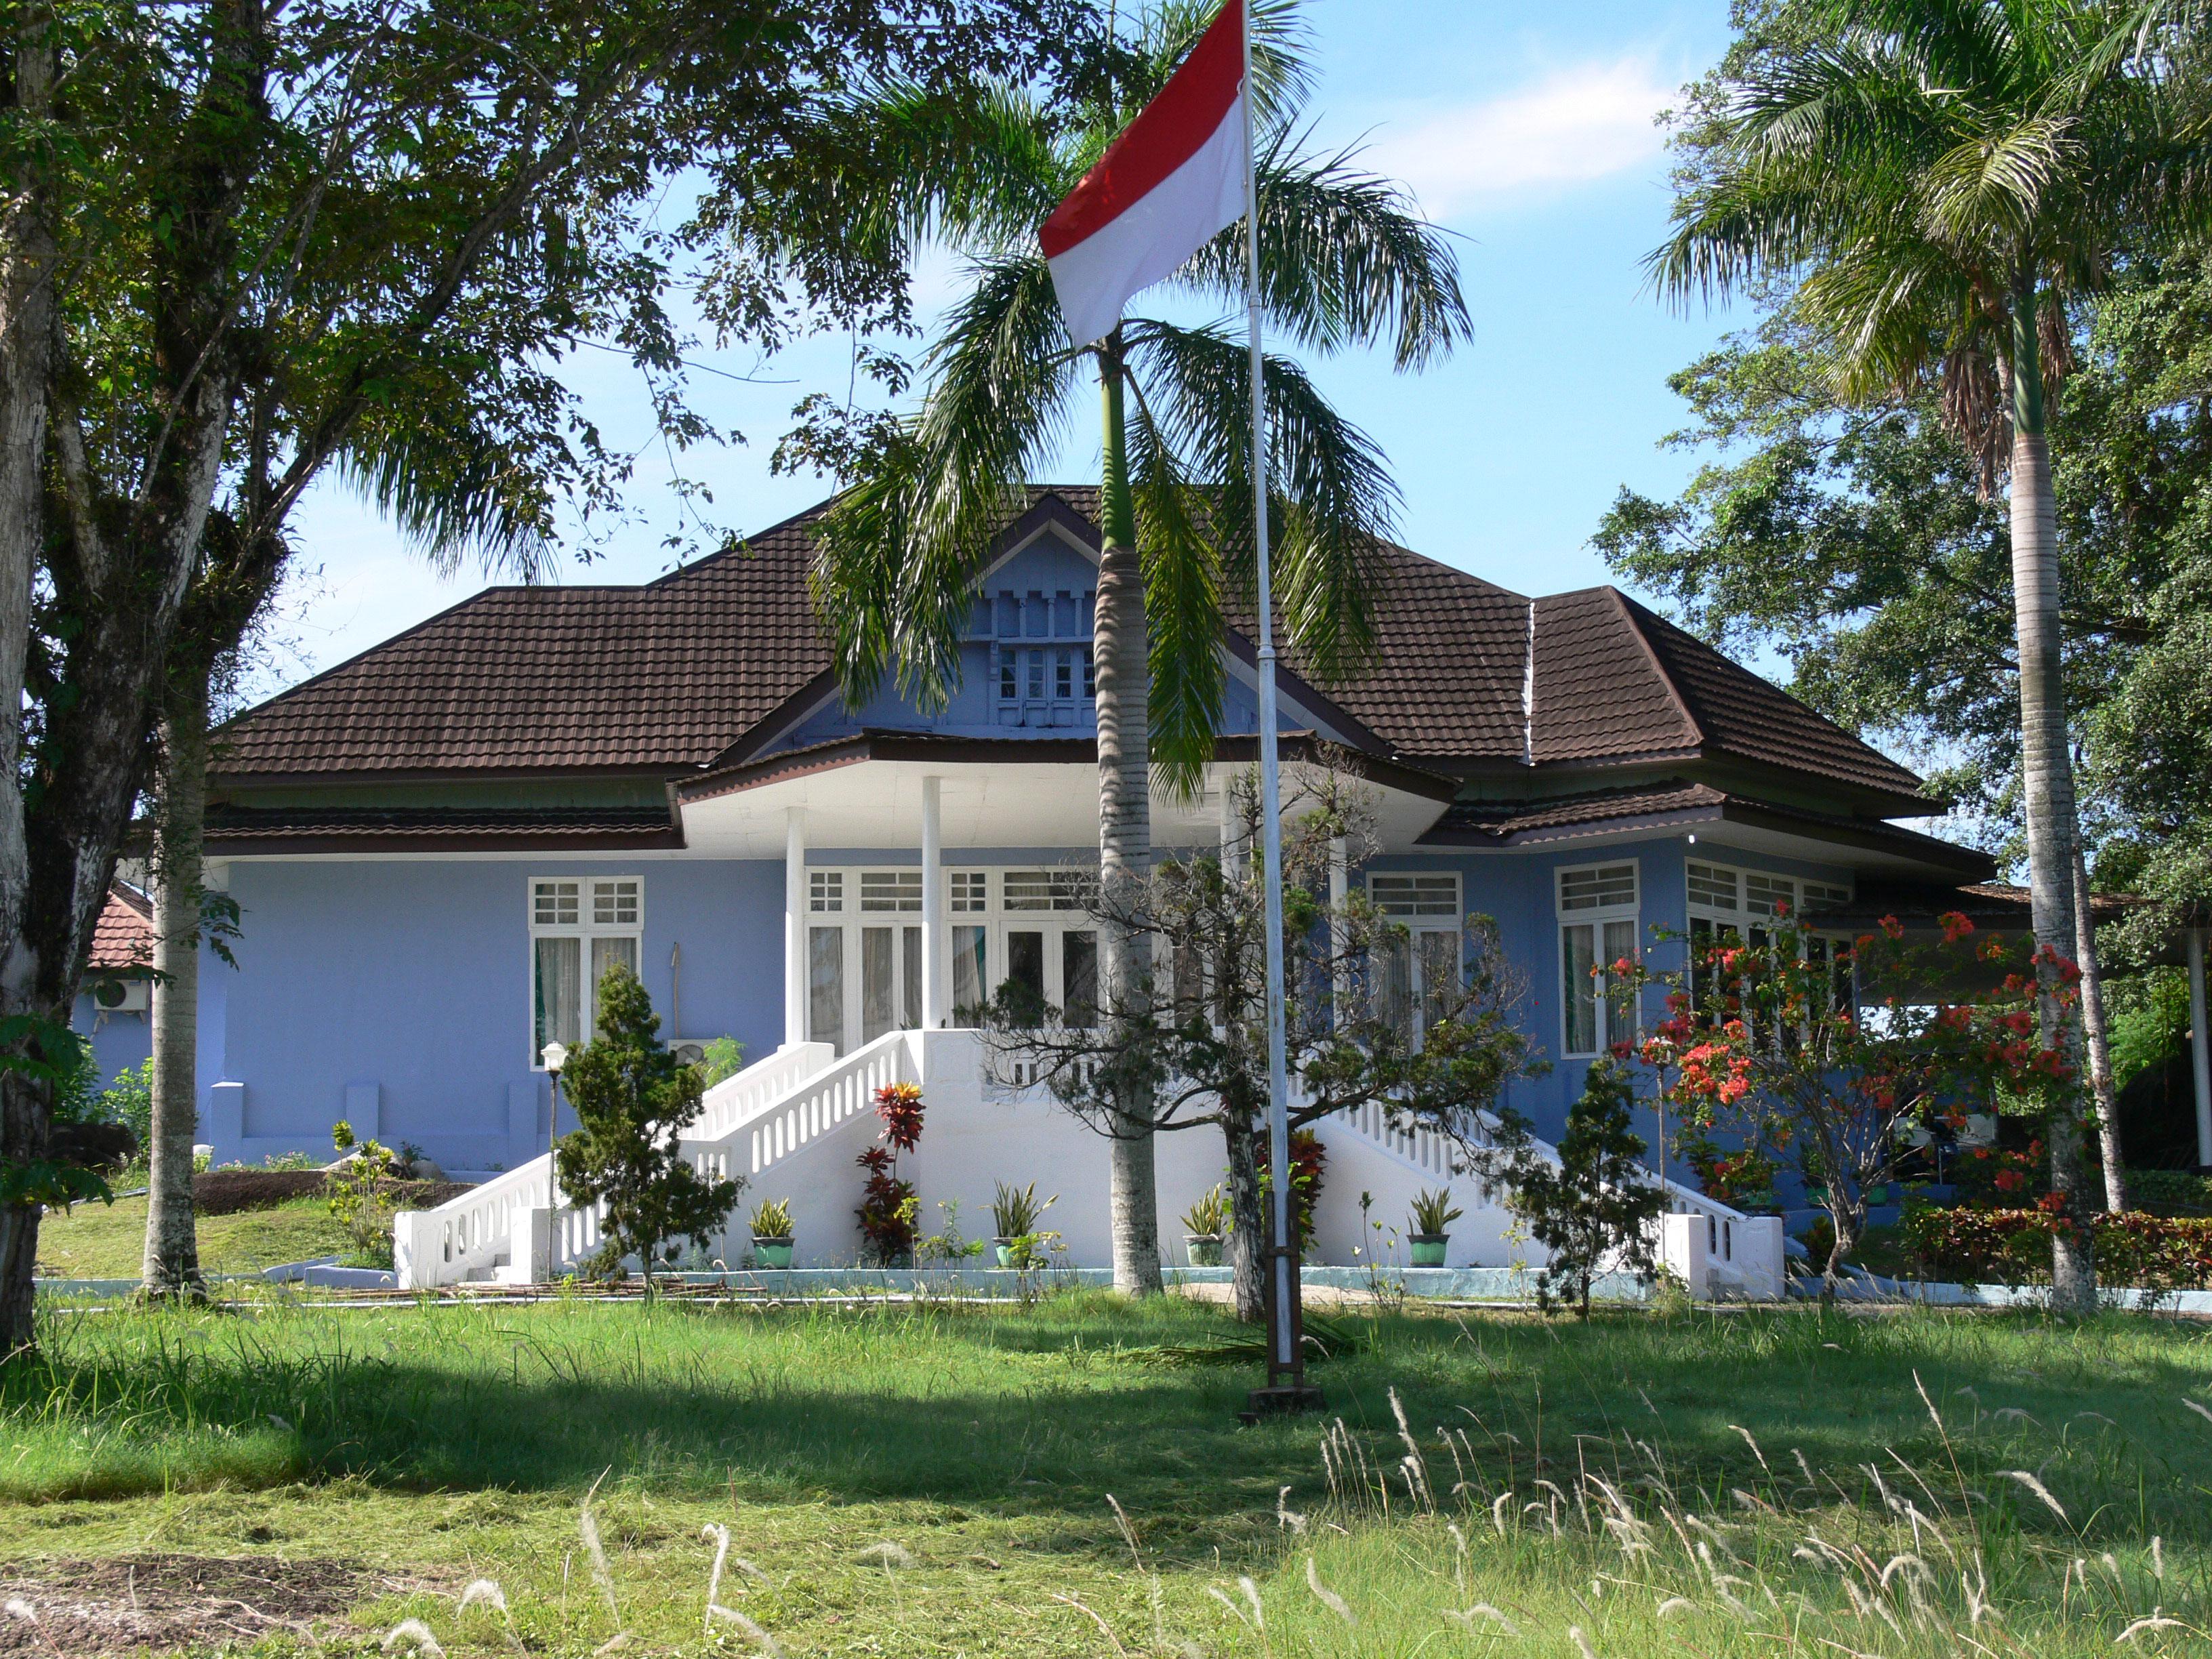 maison du gouverneur hollandais Tanjung Pandan Belitung Indonésie